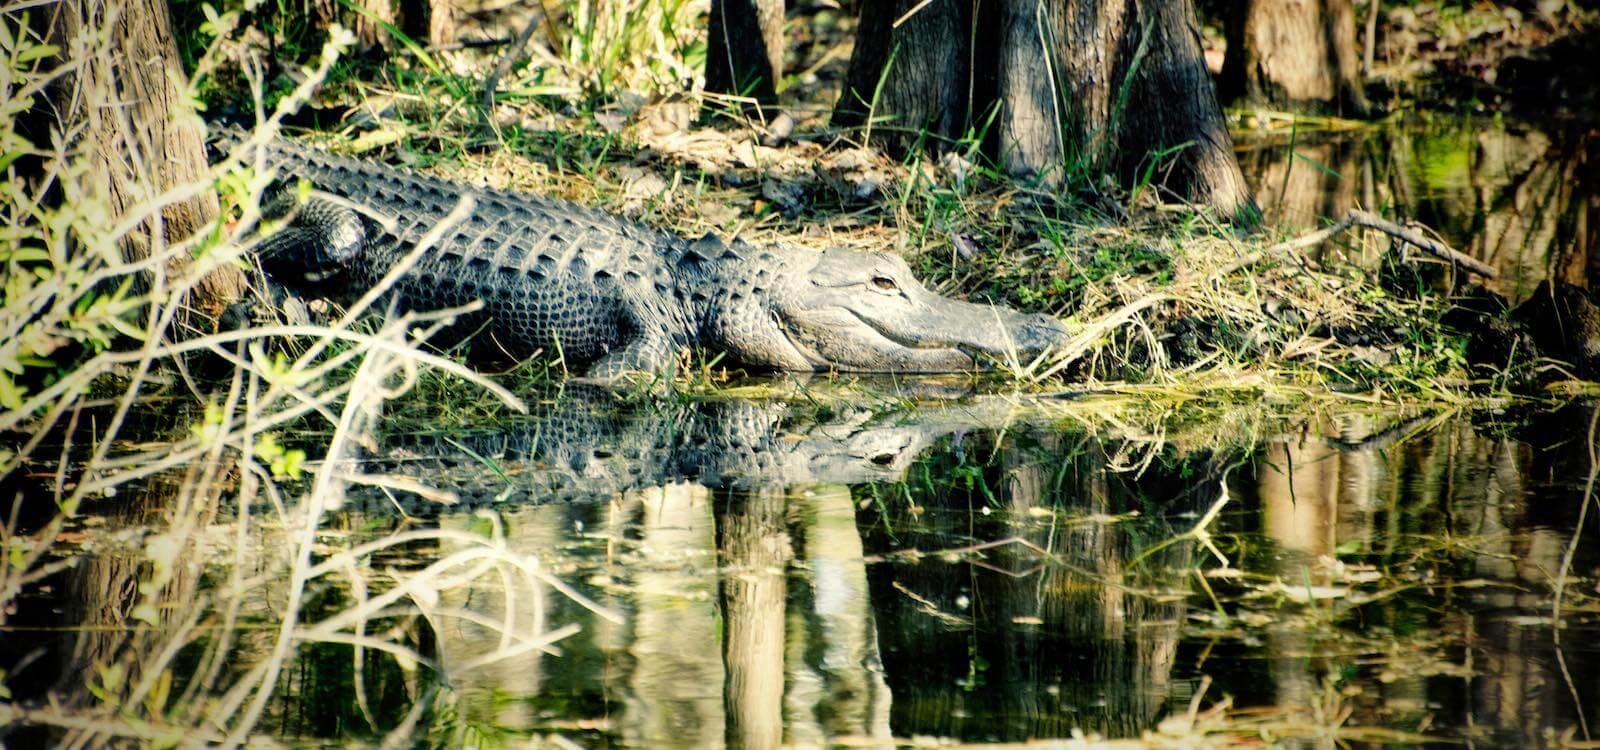 must-do-florida-everglades-wildlife-alligator